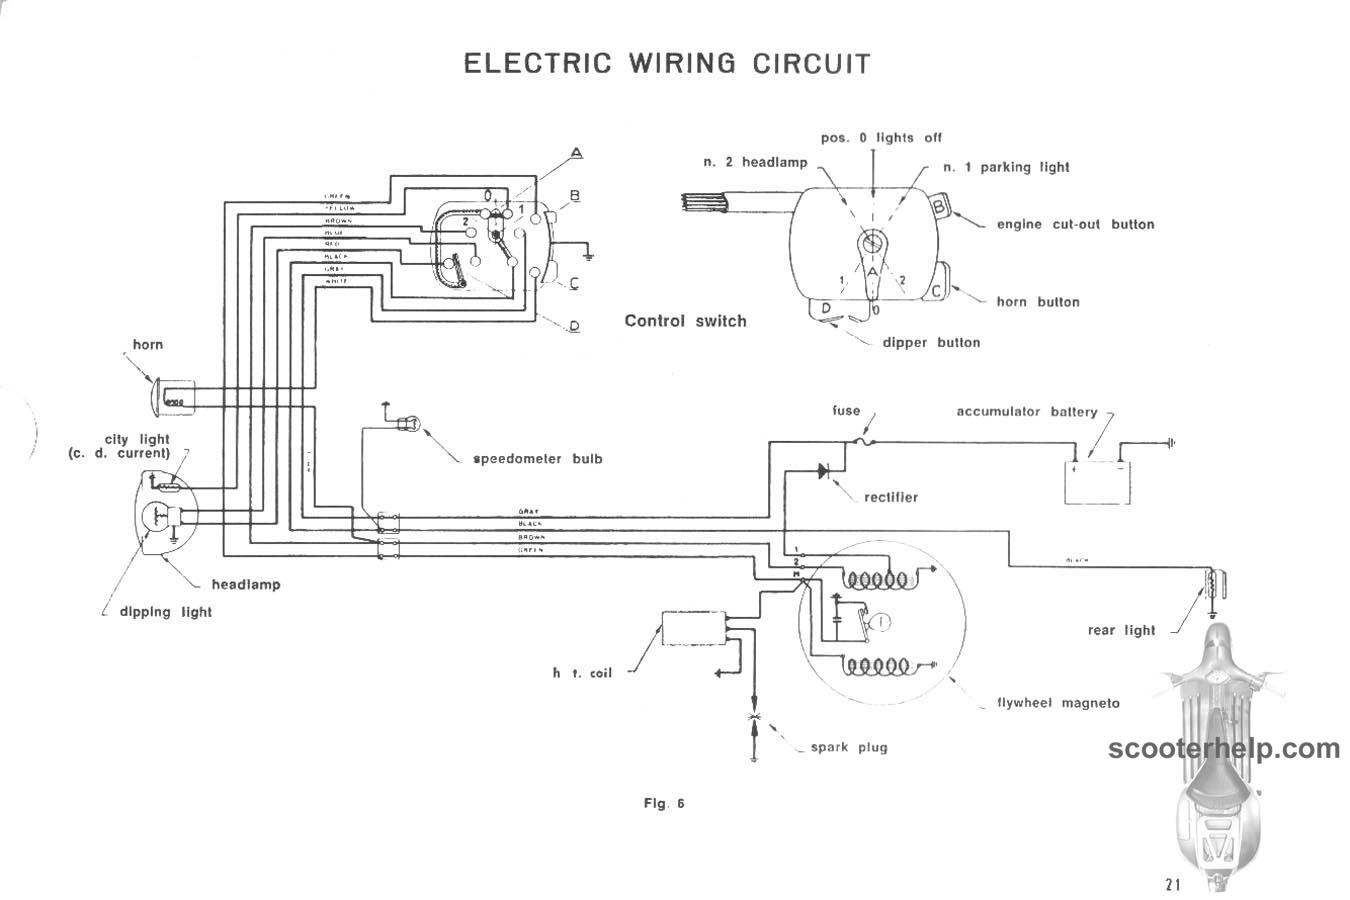 21?resize=665%2C443 diagrams 10581298 videx wiring diagram videx wiring diagram all videx 3101 wiring diagram at bakdesigns.co